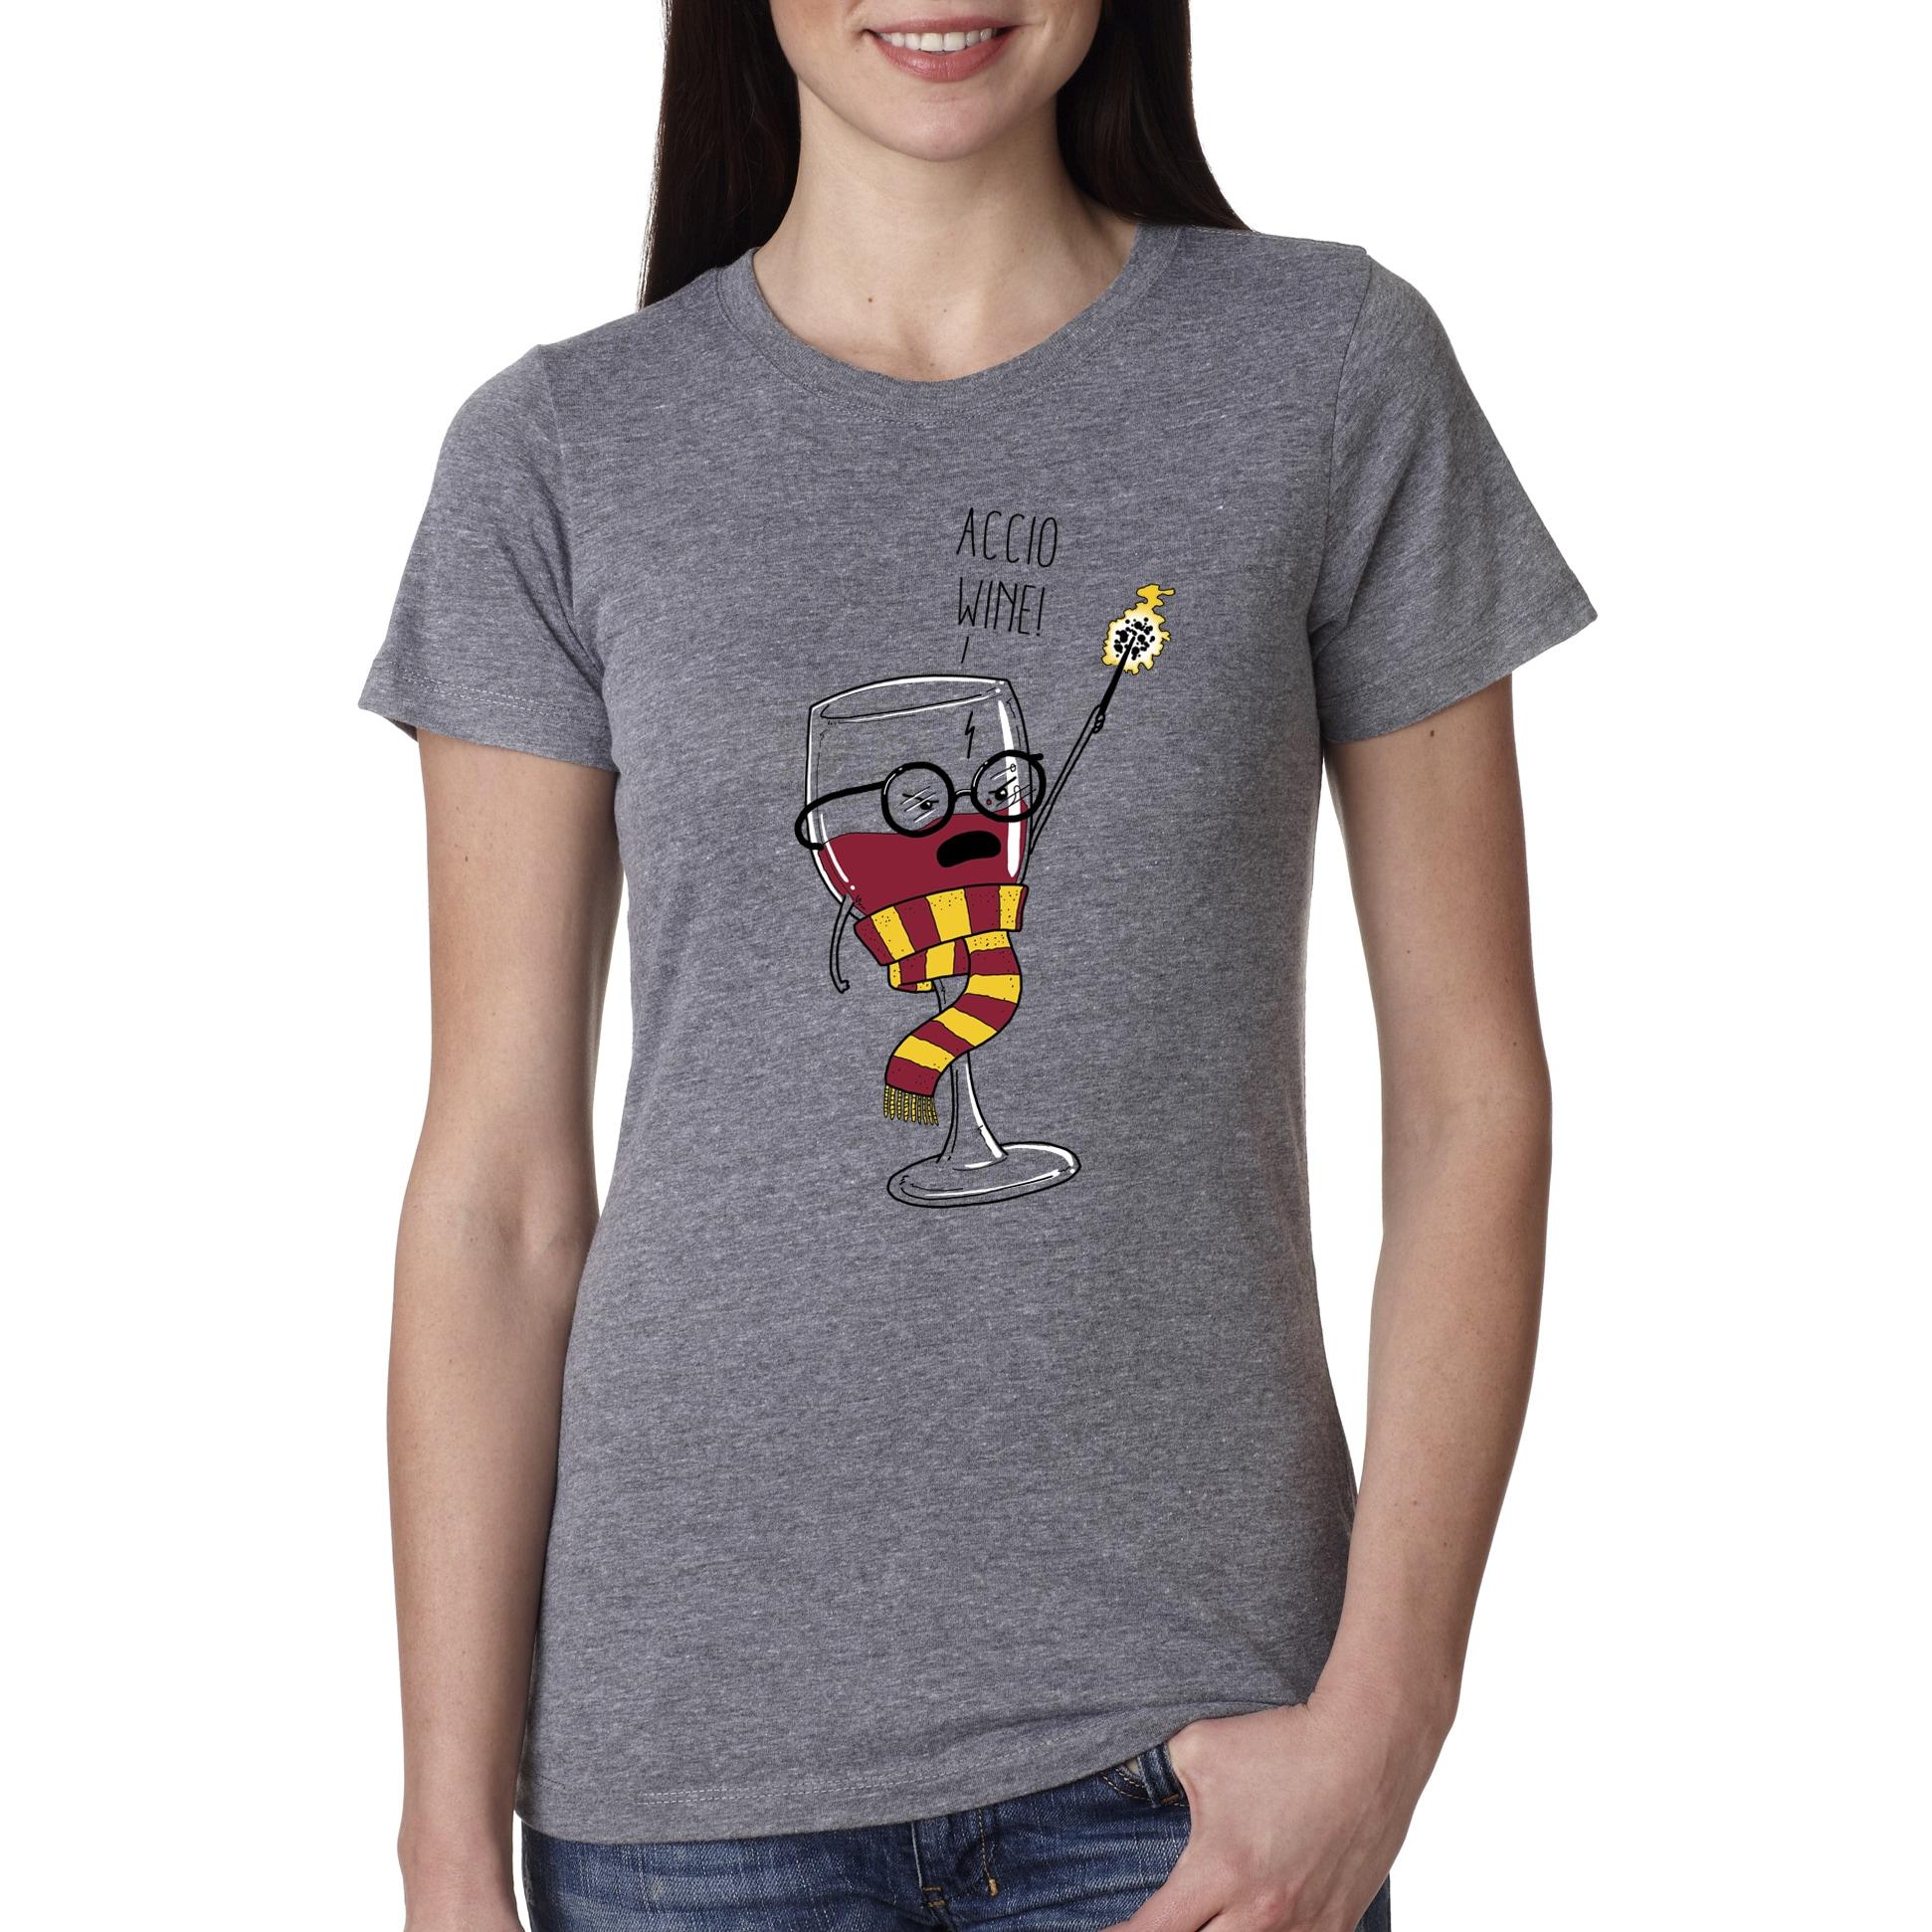 Crazy Dog Women's Funny 'Accio Wine' Grey Cotton T-shirt ...